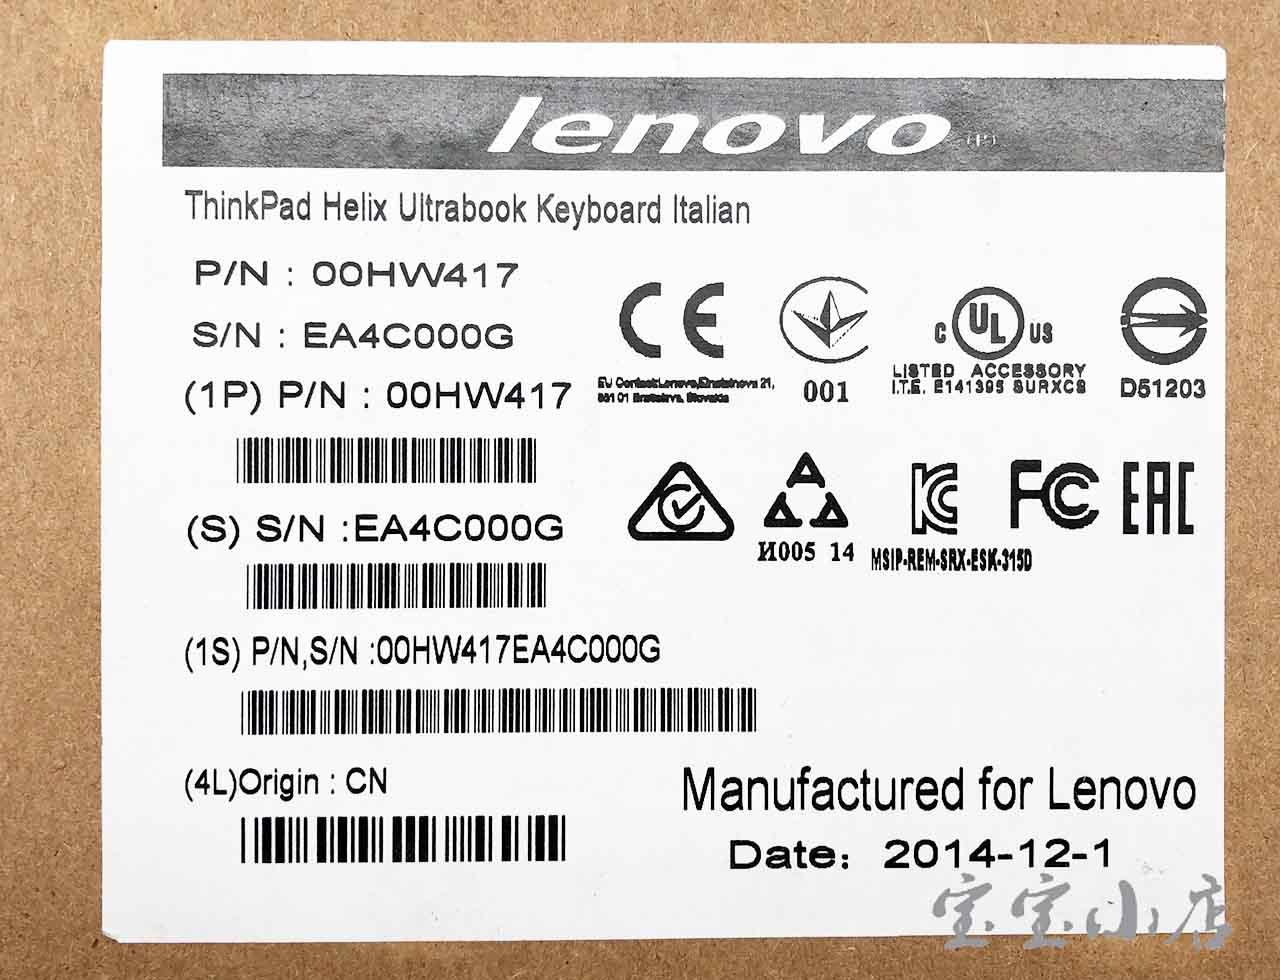 联想Lenovo ThinkPad Helix (Type 20CG, 20CH) 底座键盘拓展坞USB2.0带笔槽Italy IT keyboard 00HW417 4X30G93870 SM10F45017